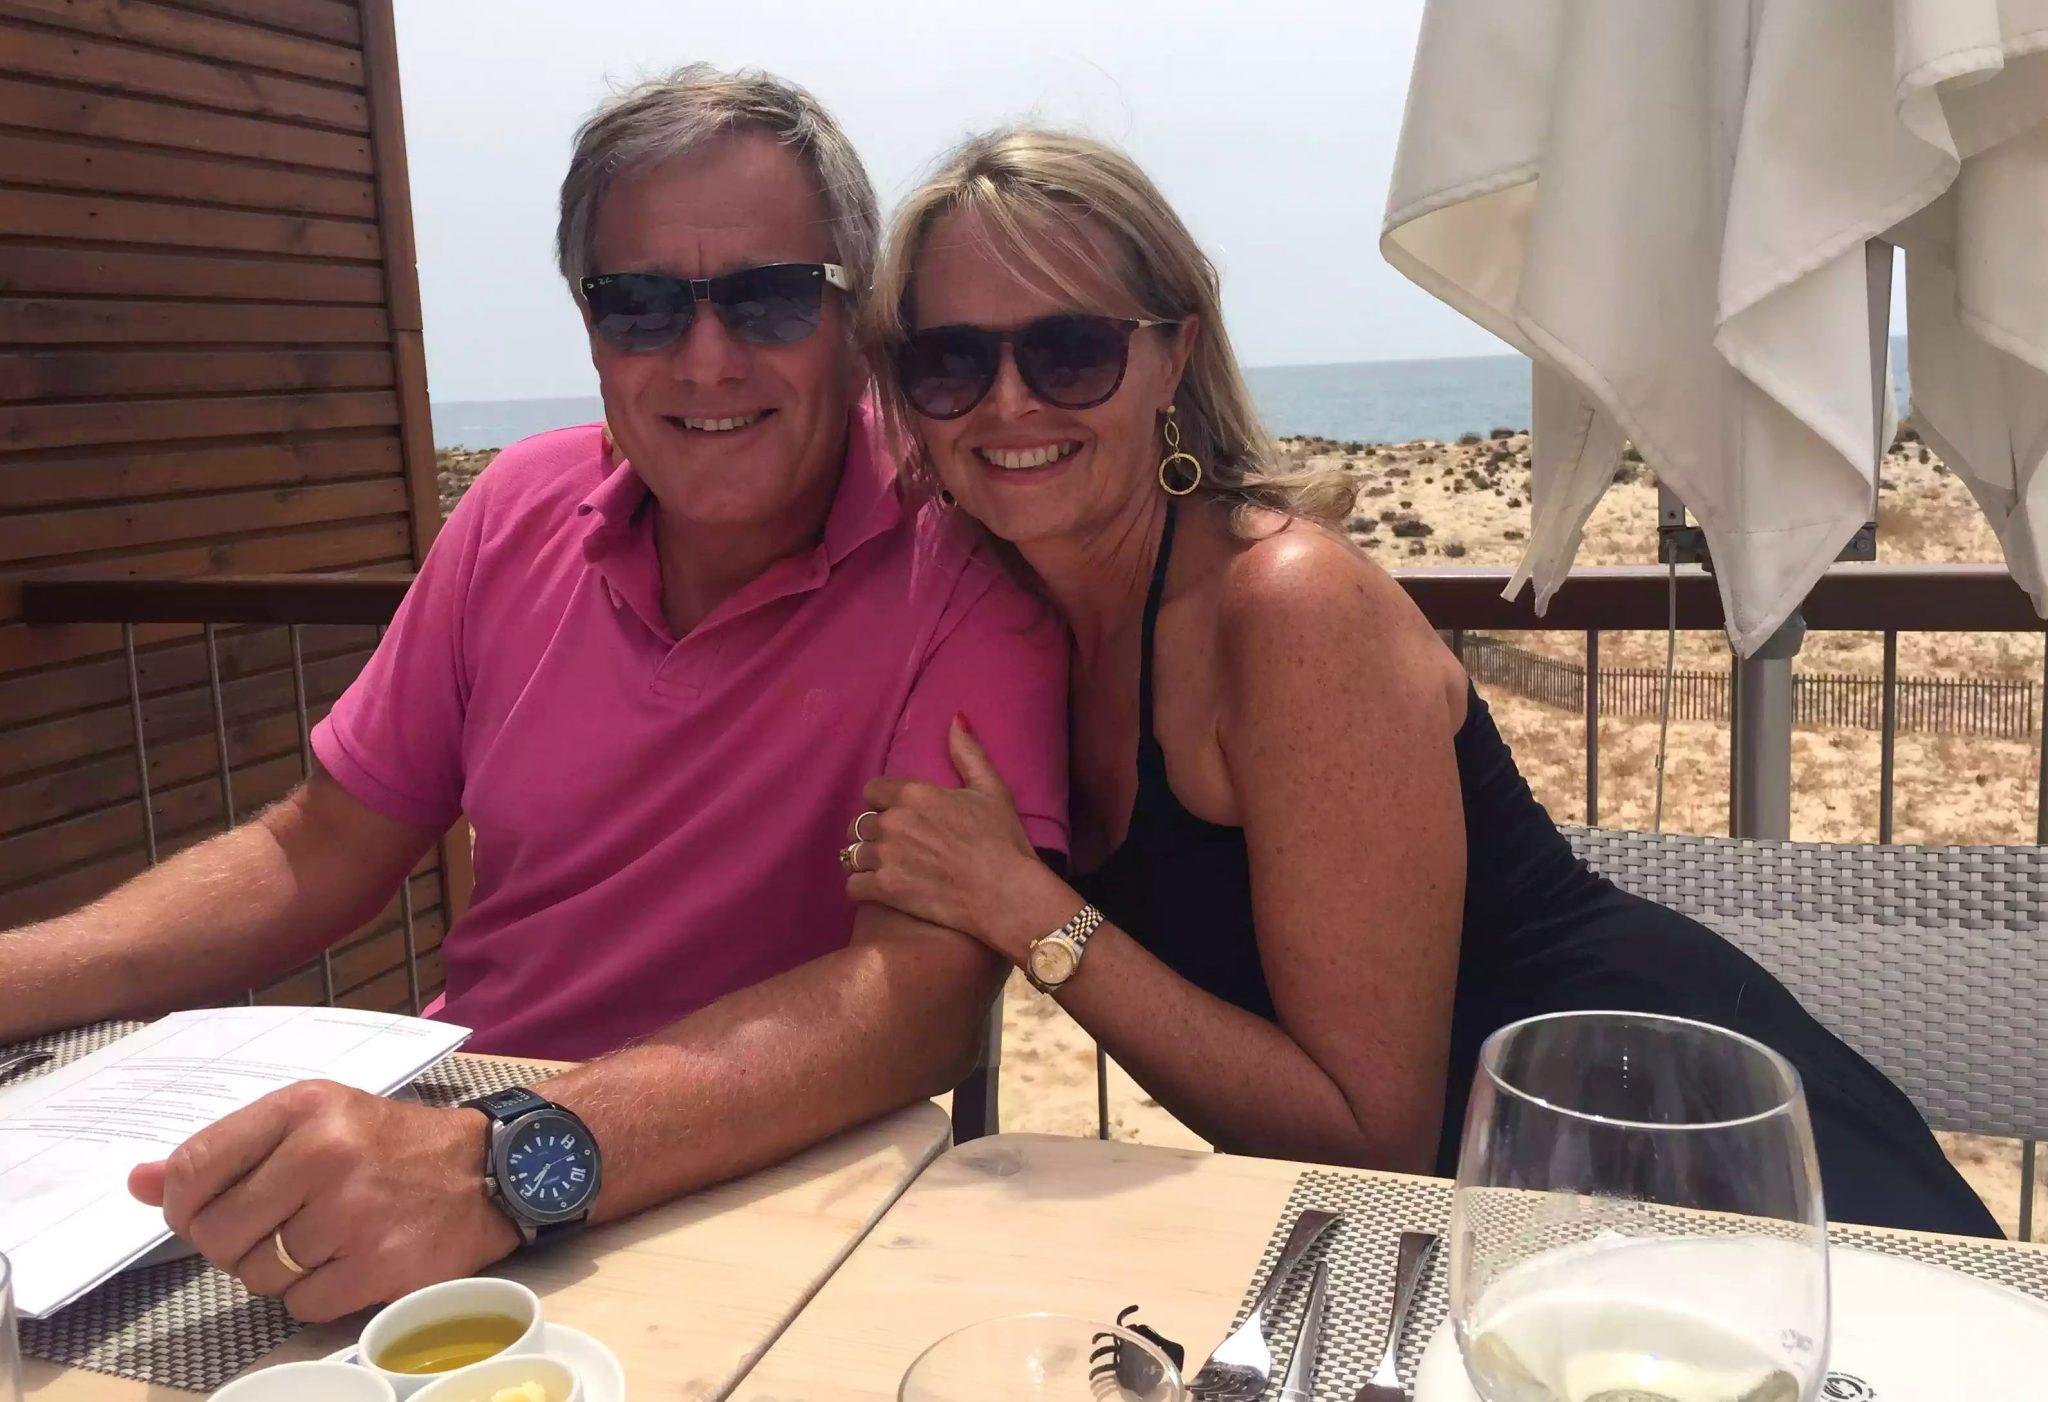 2Passos - Praia d'Ancao -Algarve - Portugal - Lunch